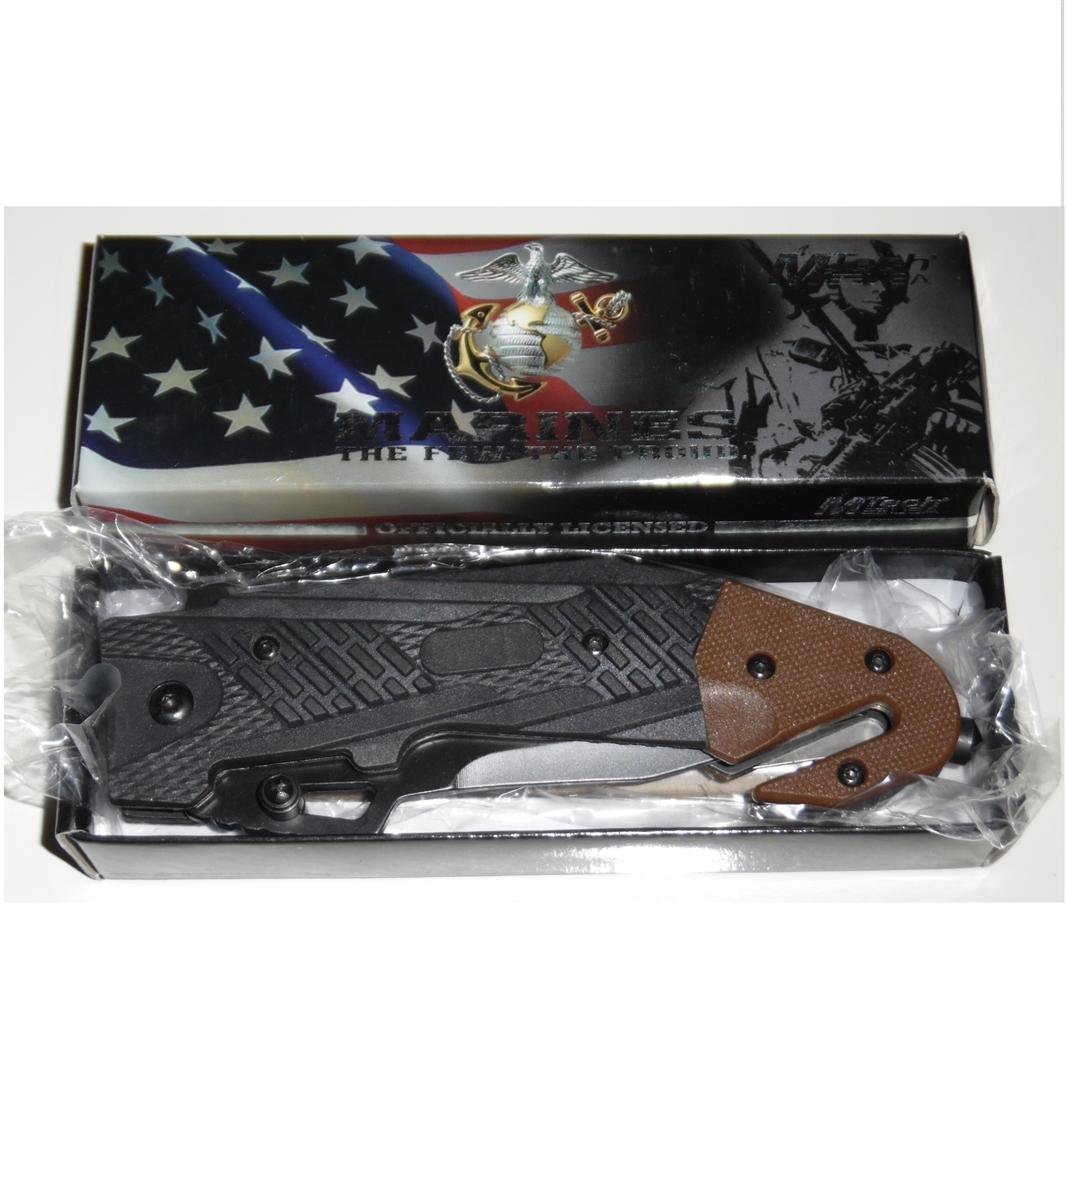 MTech USA Officially Licensed USMC Knife, SideWinder